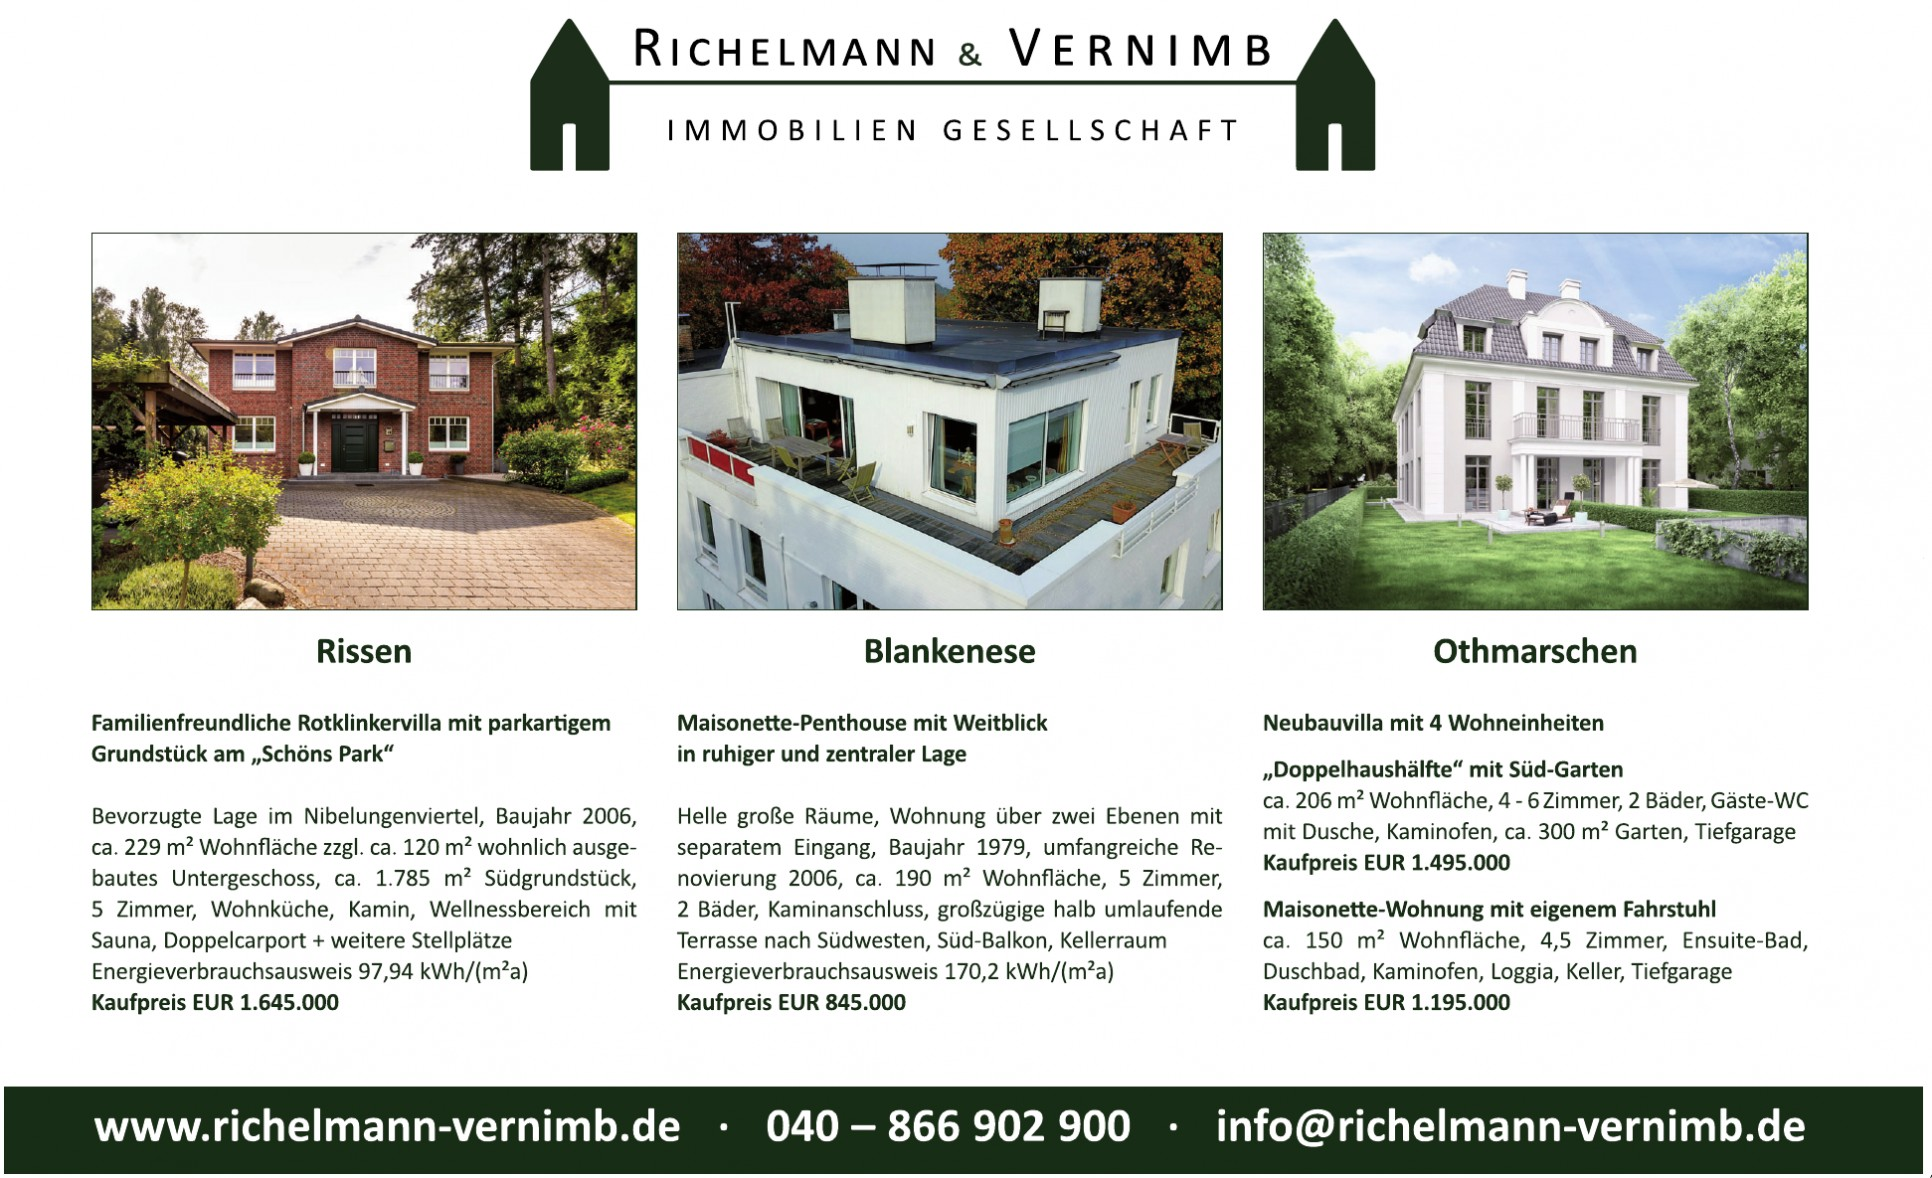 Richelmann & Vernimb Immobilien GmbH